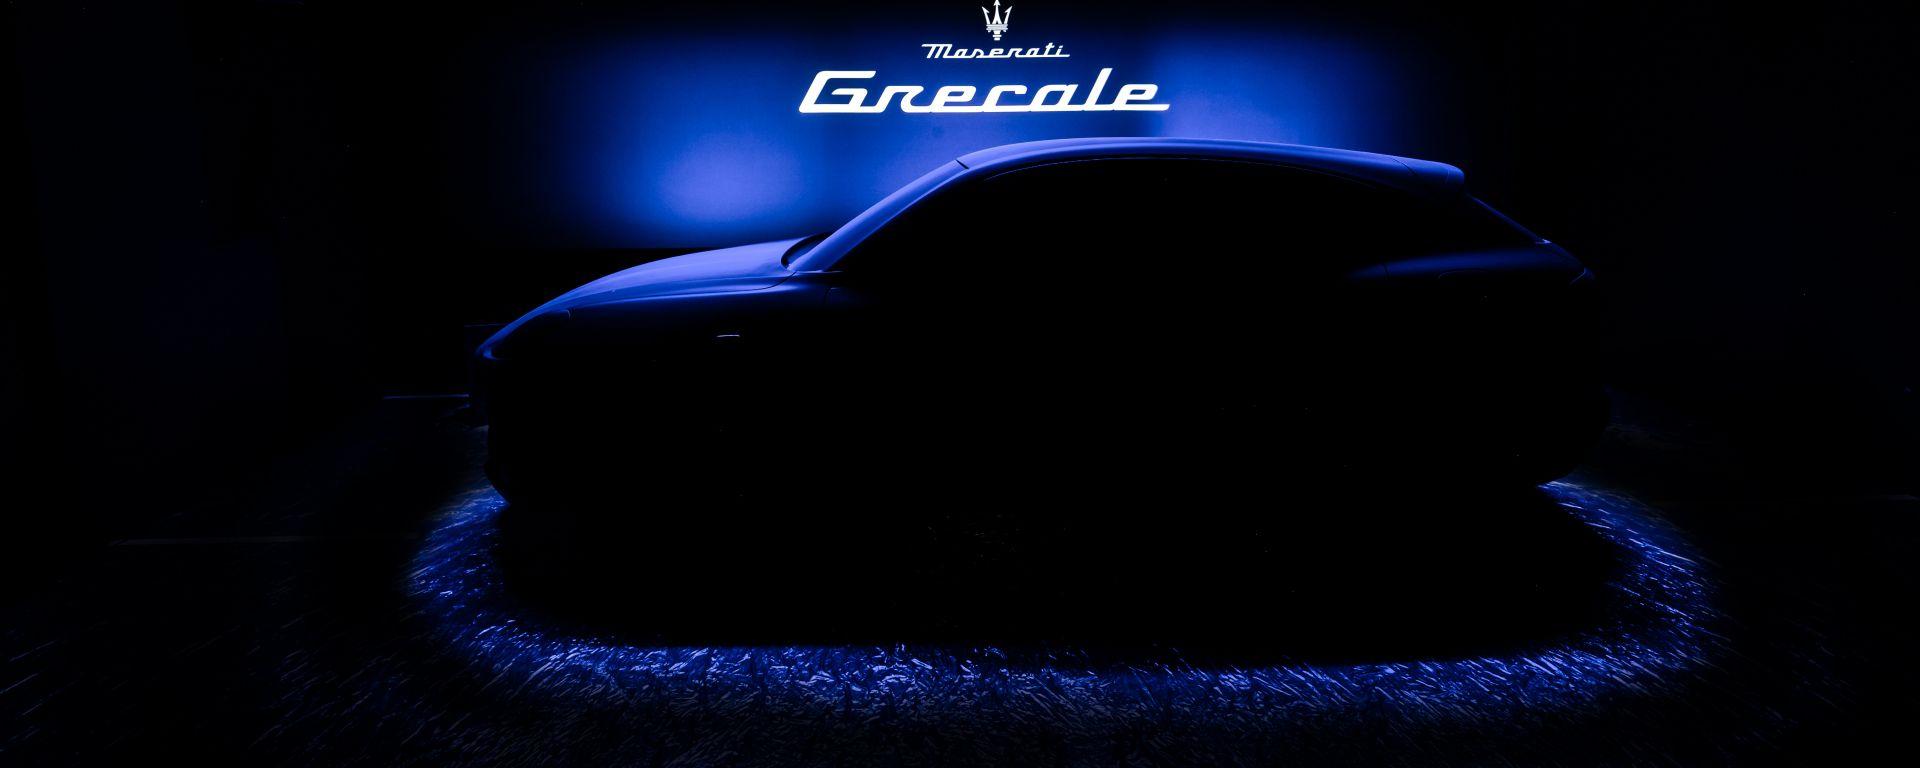 Maserati Grecale, primo teaser